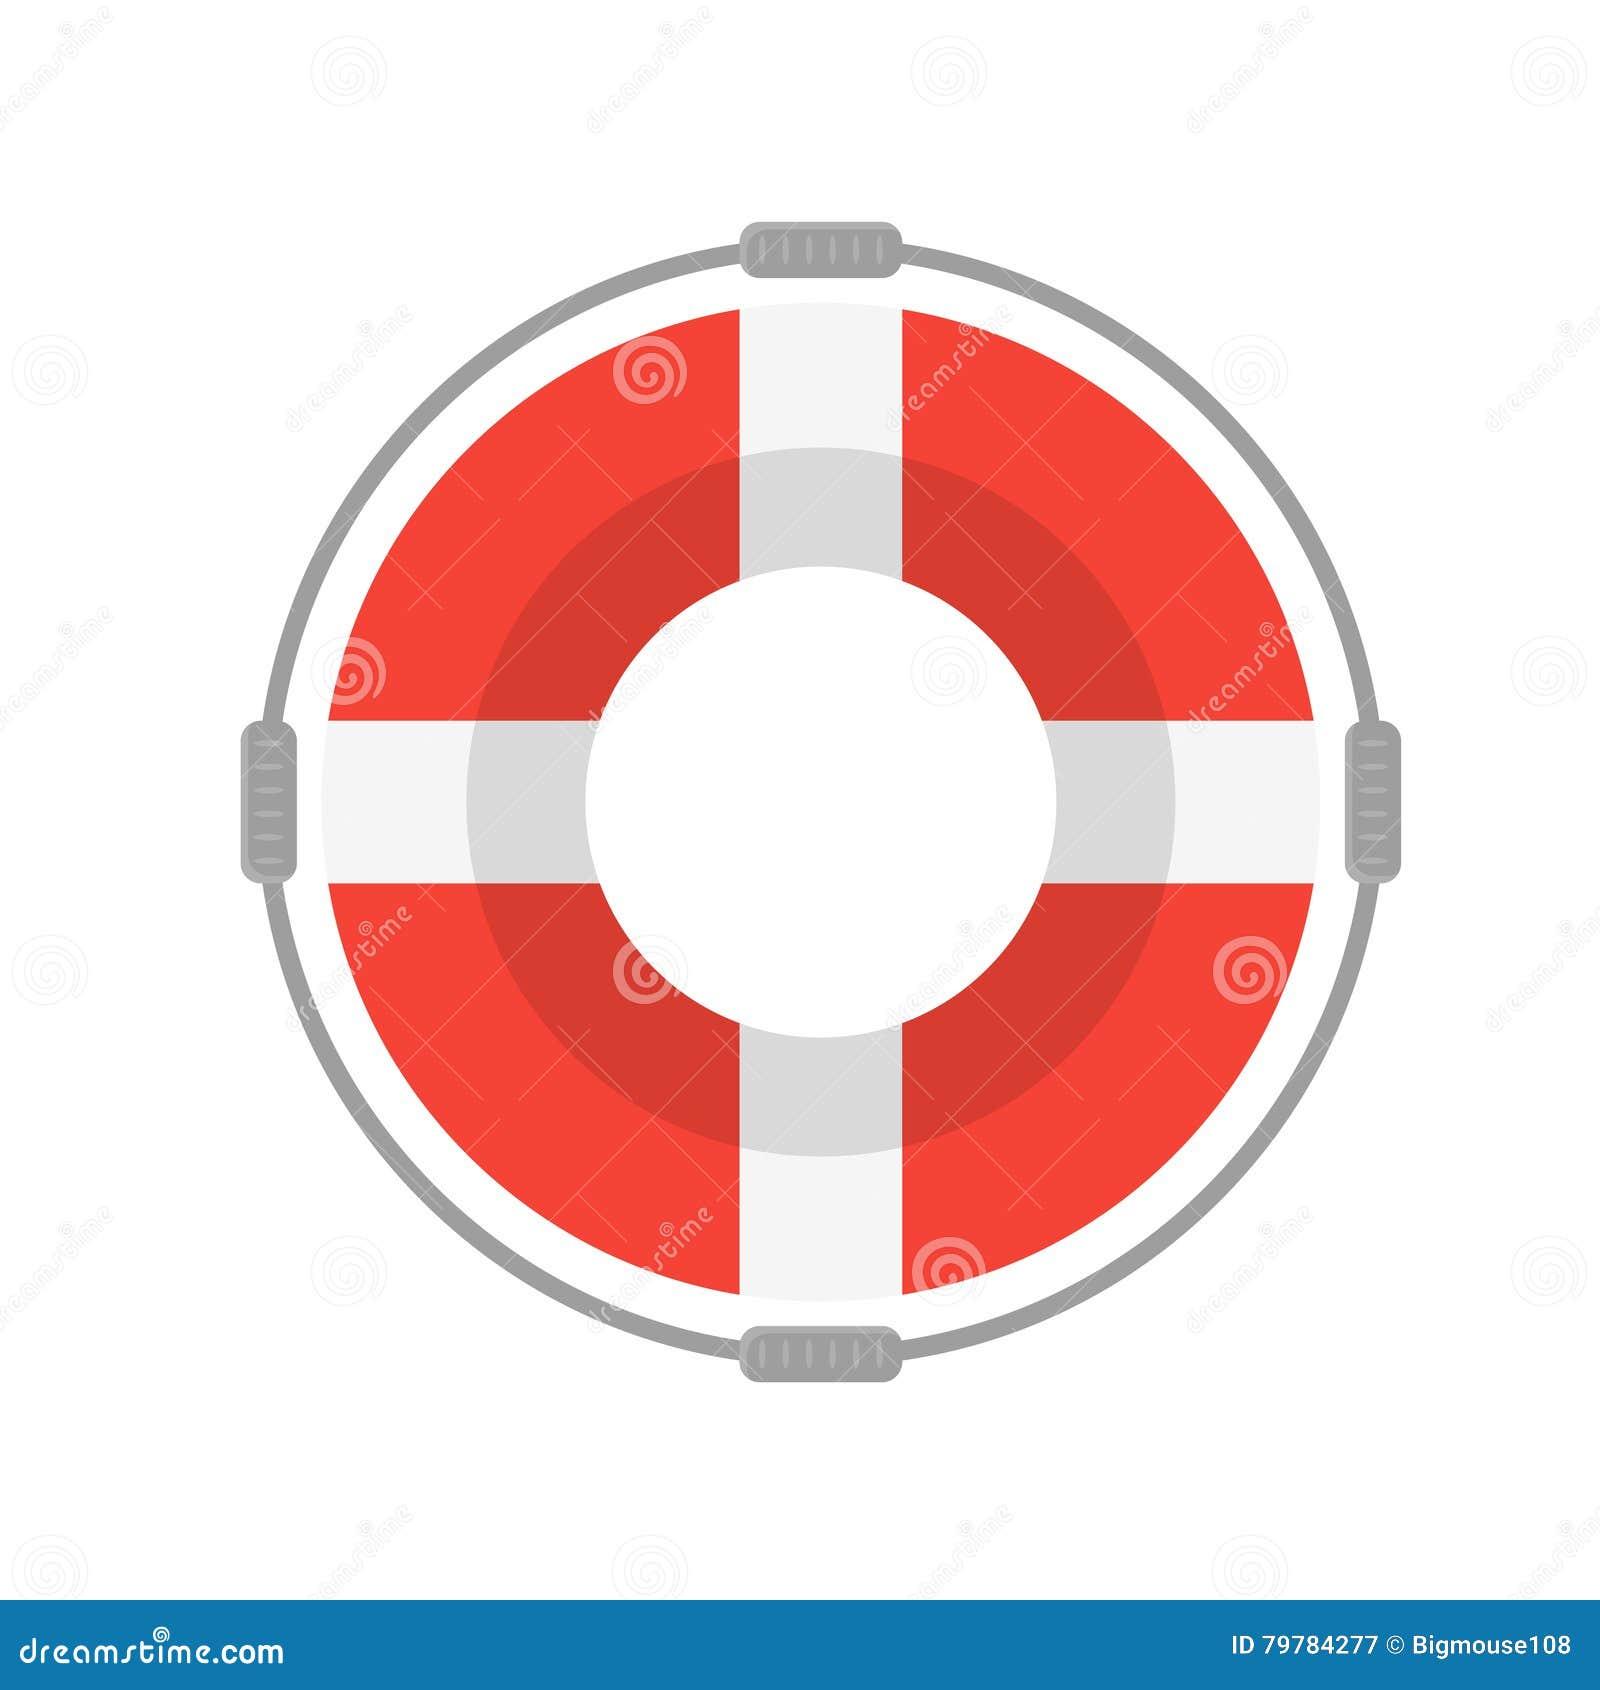 e5ca270e92e8 Life Buoy with Rope On White Background. Flat Design Style Vector  illustration. More similar stock illustrations